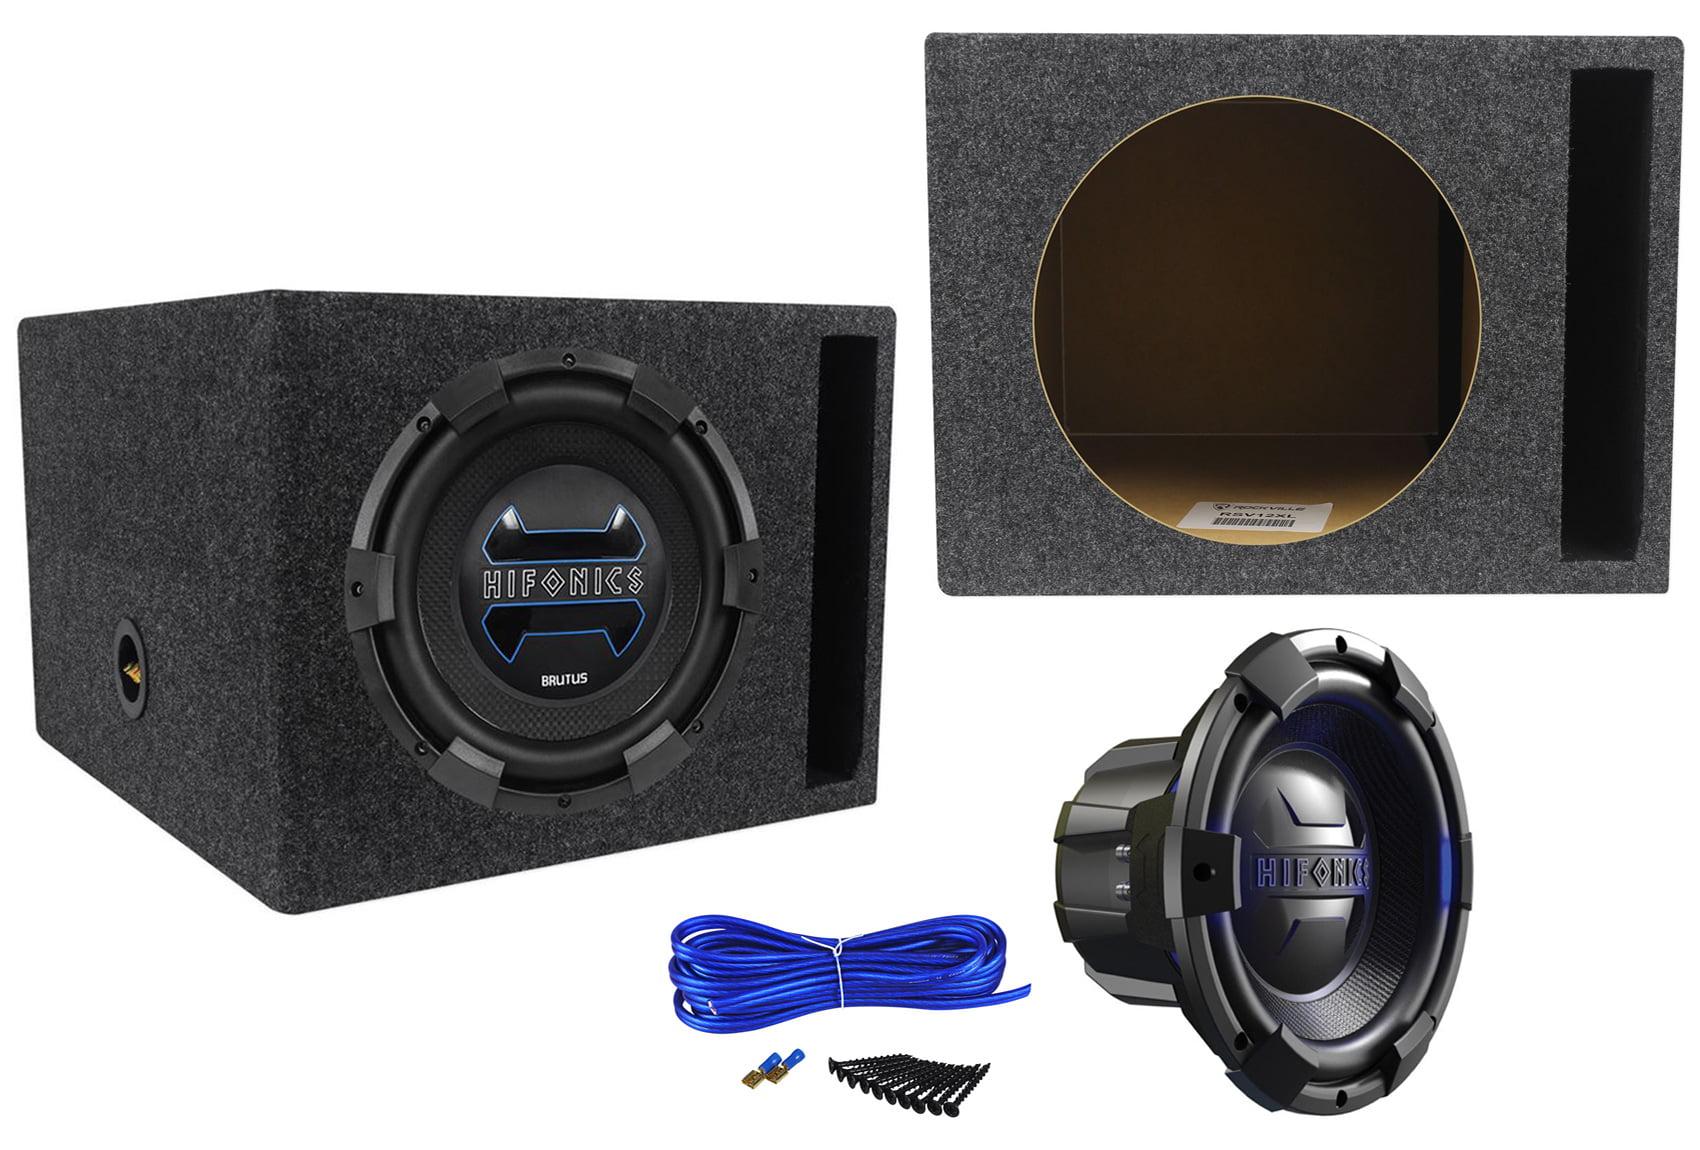 Hifonics Brx12d4 Brutus 12 900 Watt Car Subwoofer Vented Sub Enclosure Dual Wiring Kit With 14 Gauge Speaker Box